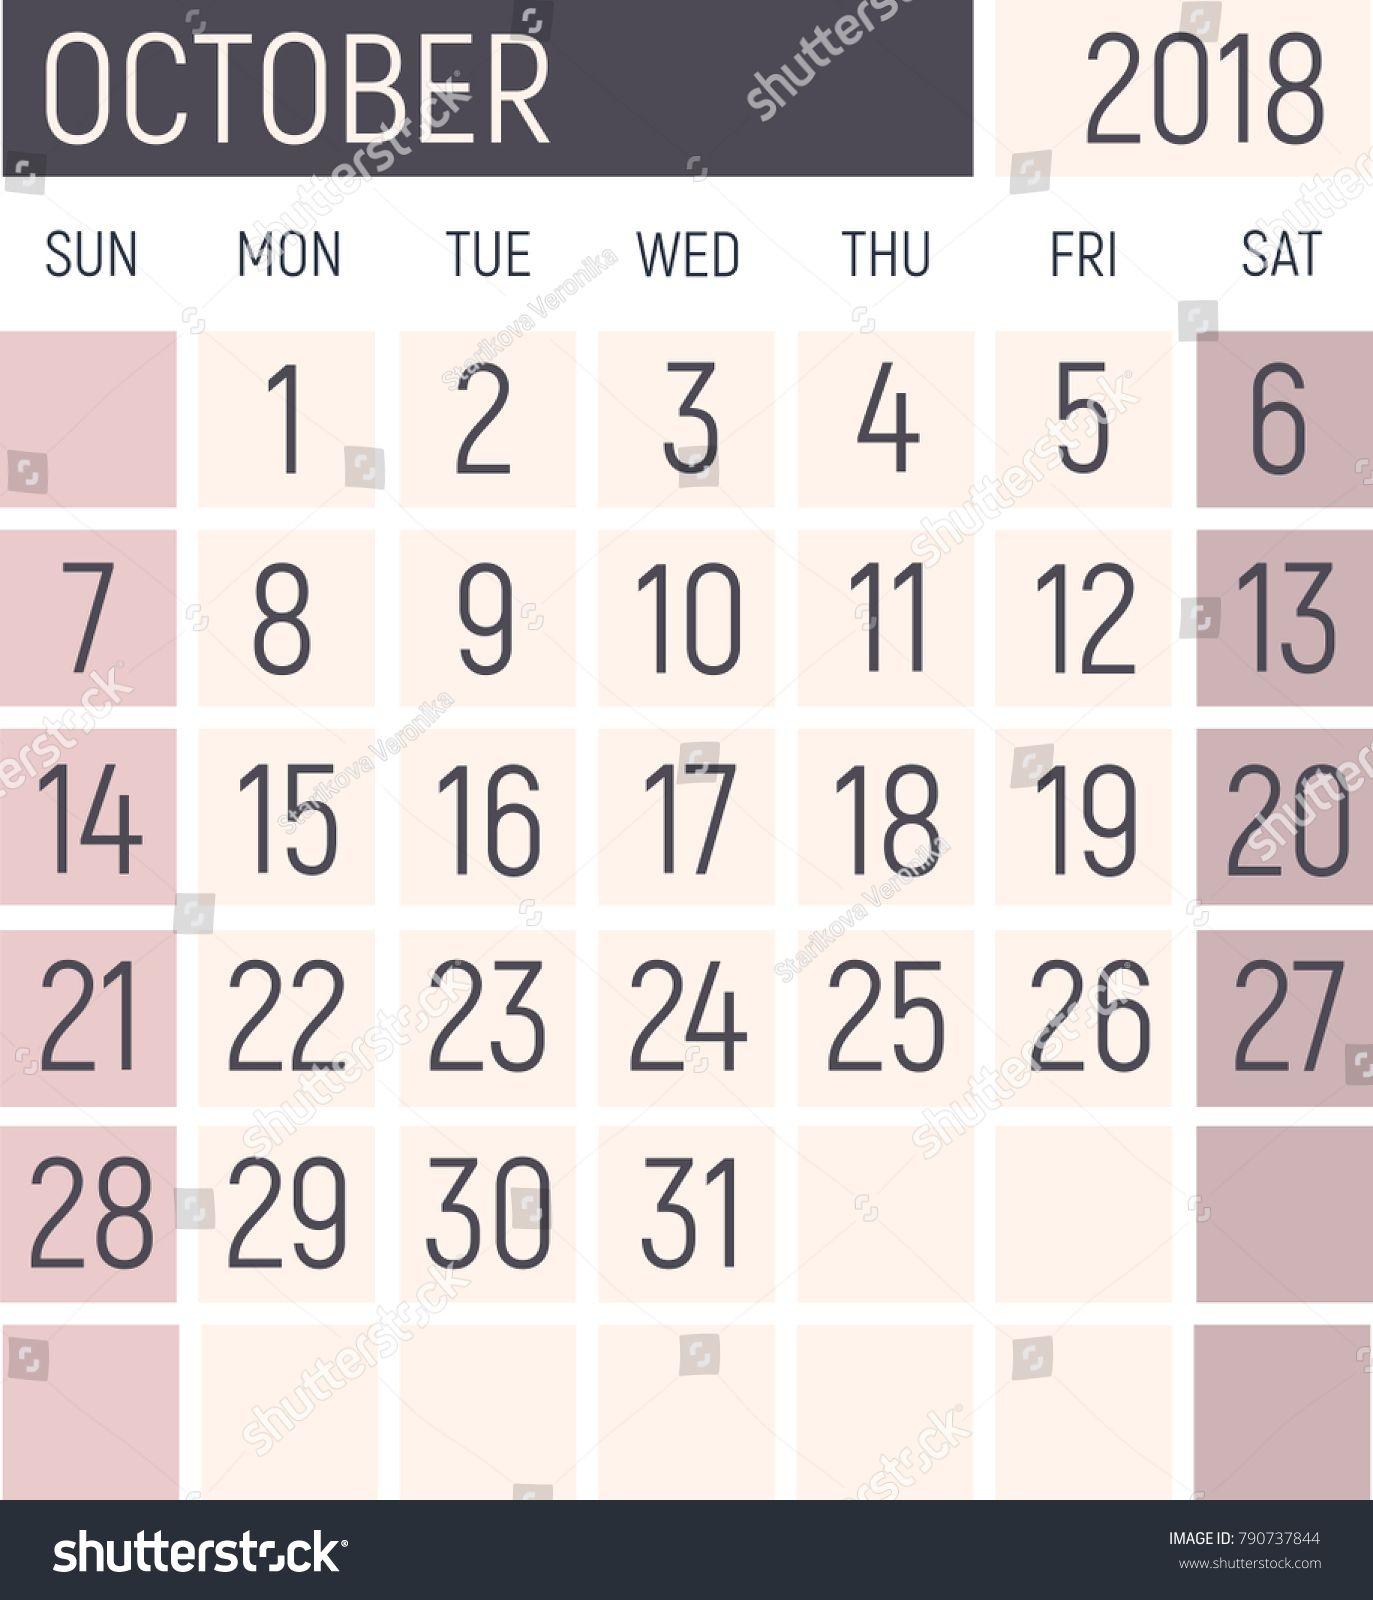 Null Printable Calendar November 2018 | Calendar Format Example inside Null Blank Calendar To Print